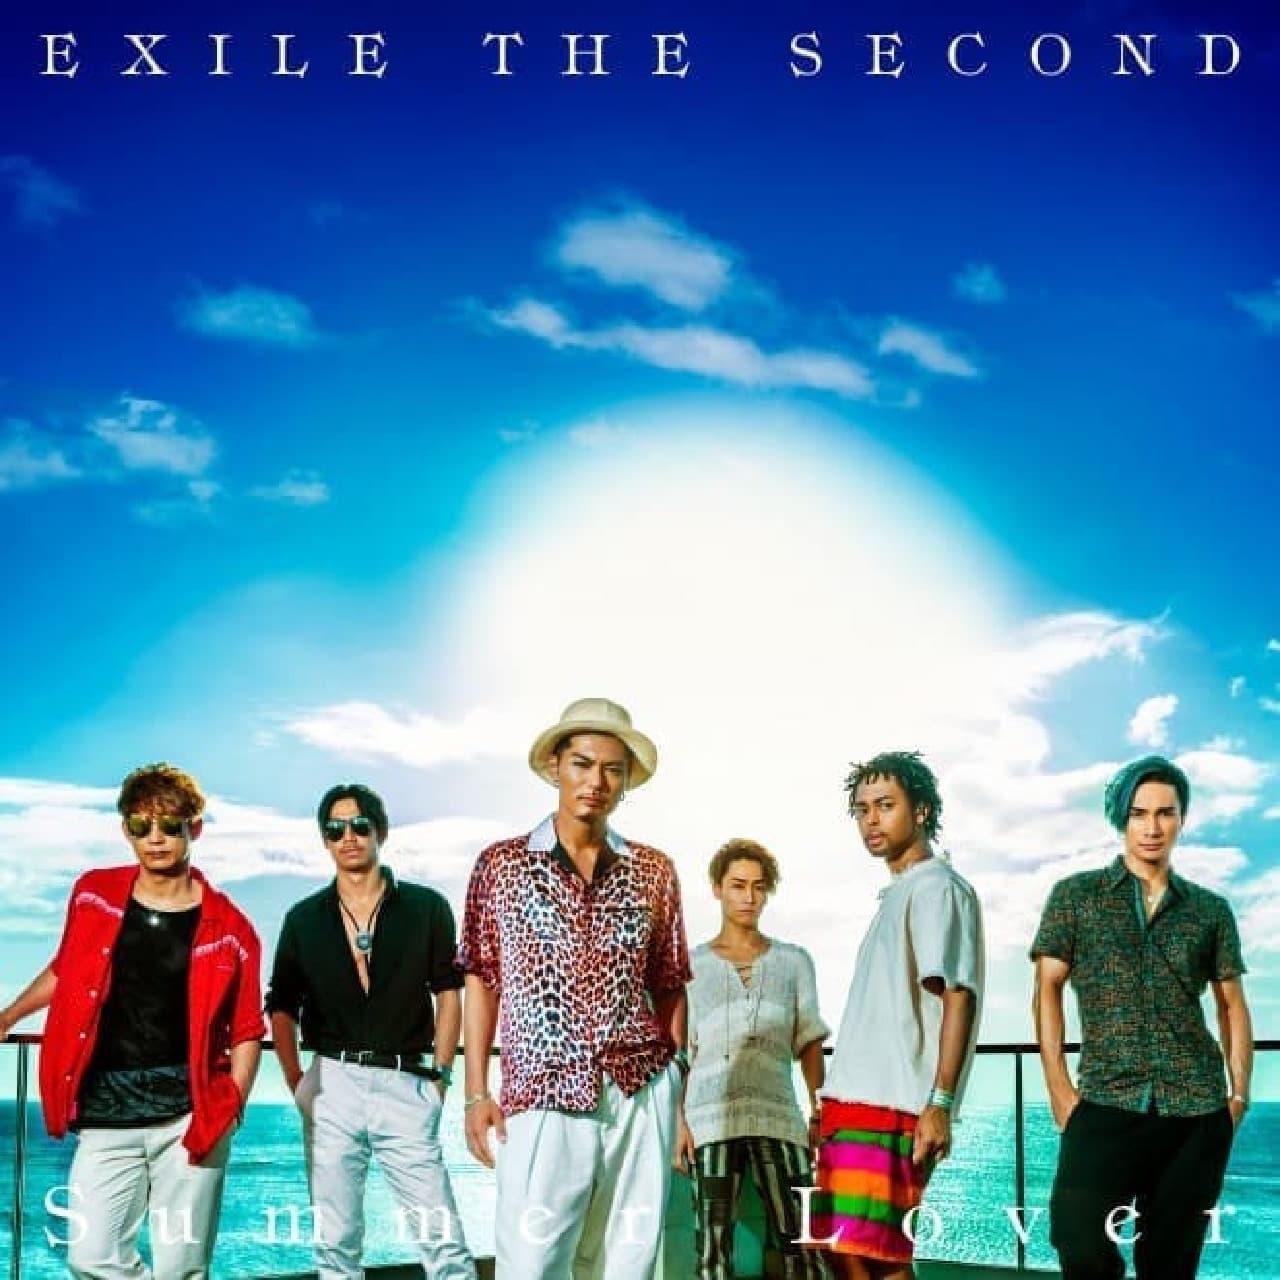 EXILE THE SECONDと鴨川シ―ワールドが夏コラボ…